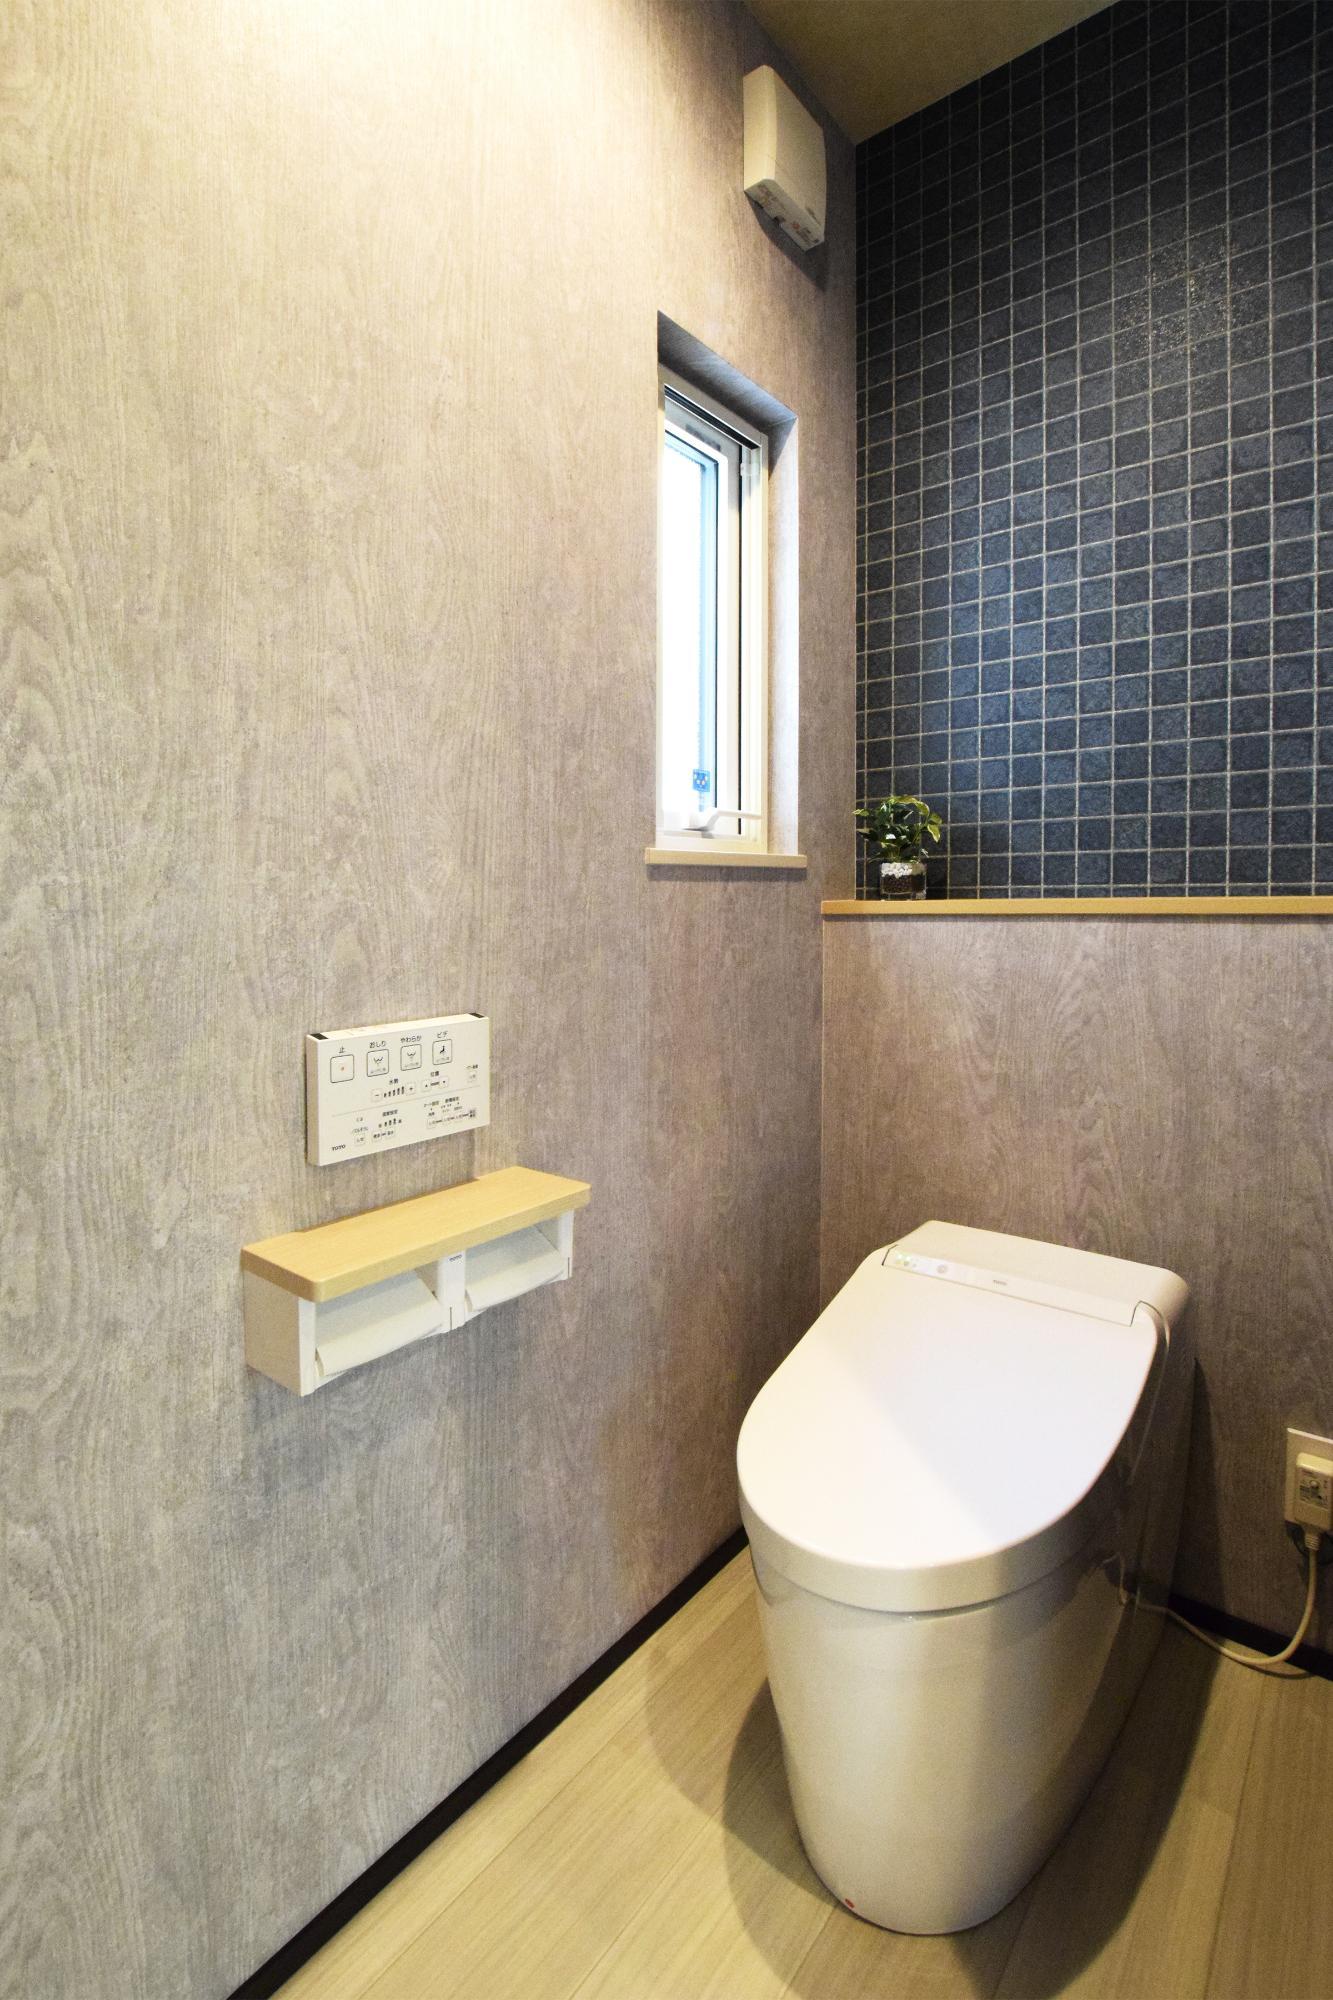 DETAIL HOME(ディテールホーム)「二世帯で住まう和モダン平屋住宅」のモダン・和風・和モダンなトイレの実例写真